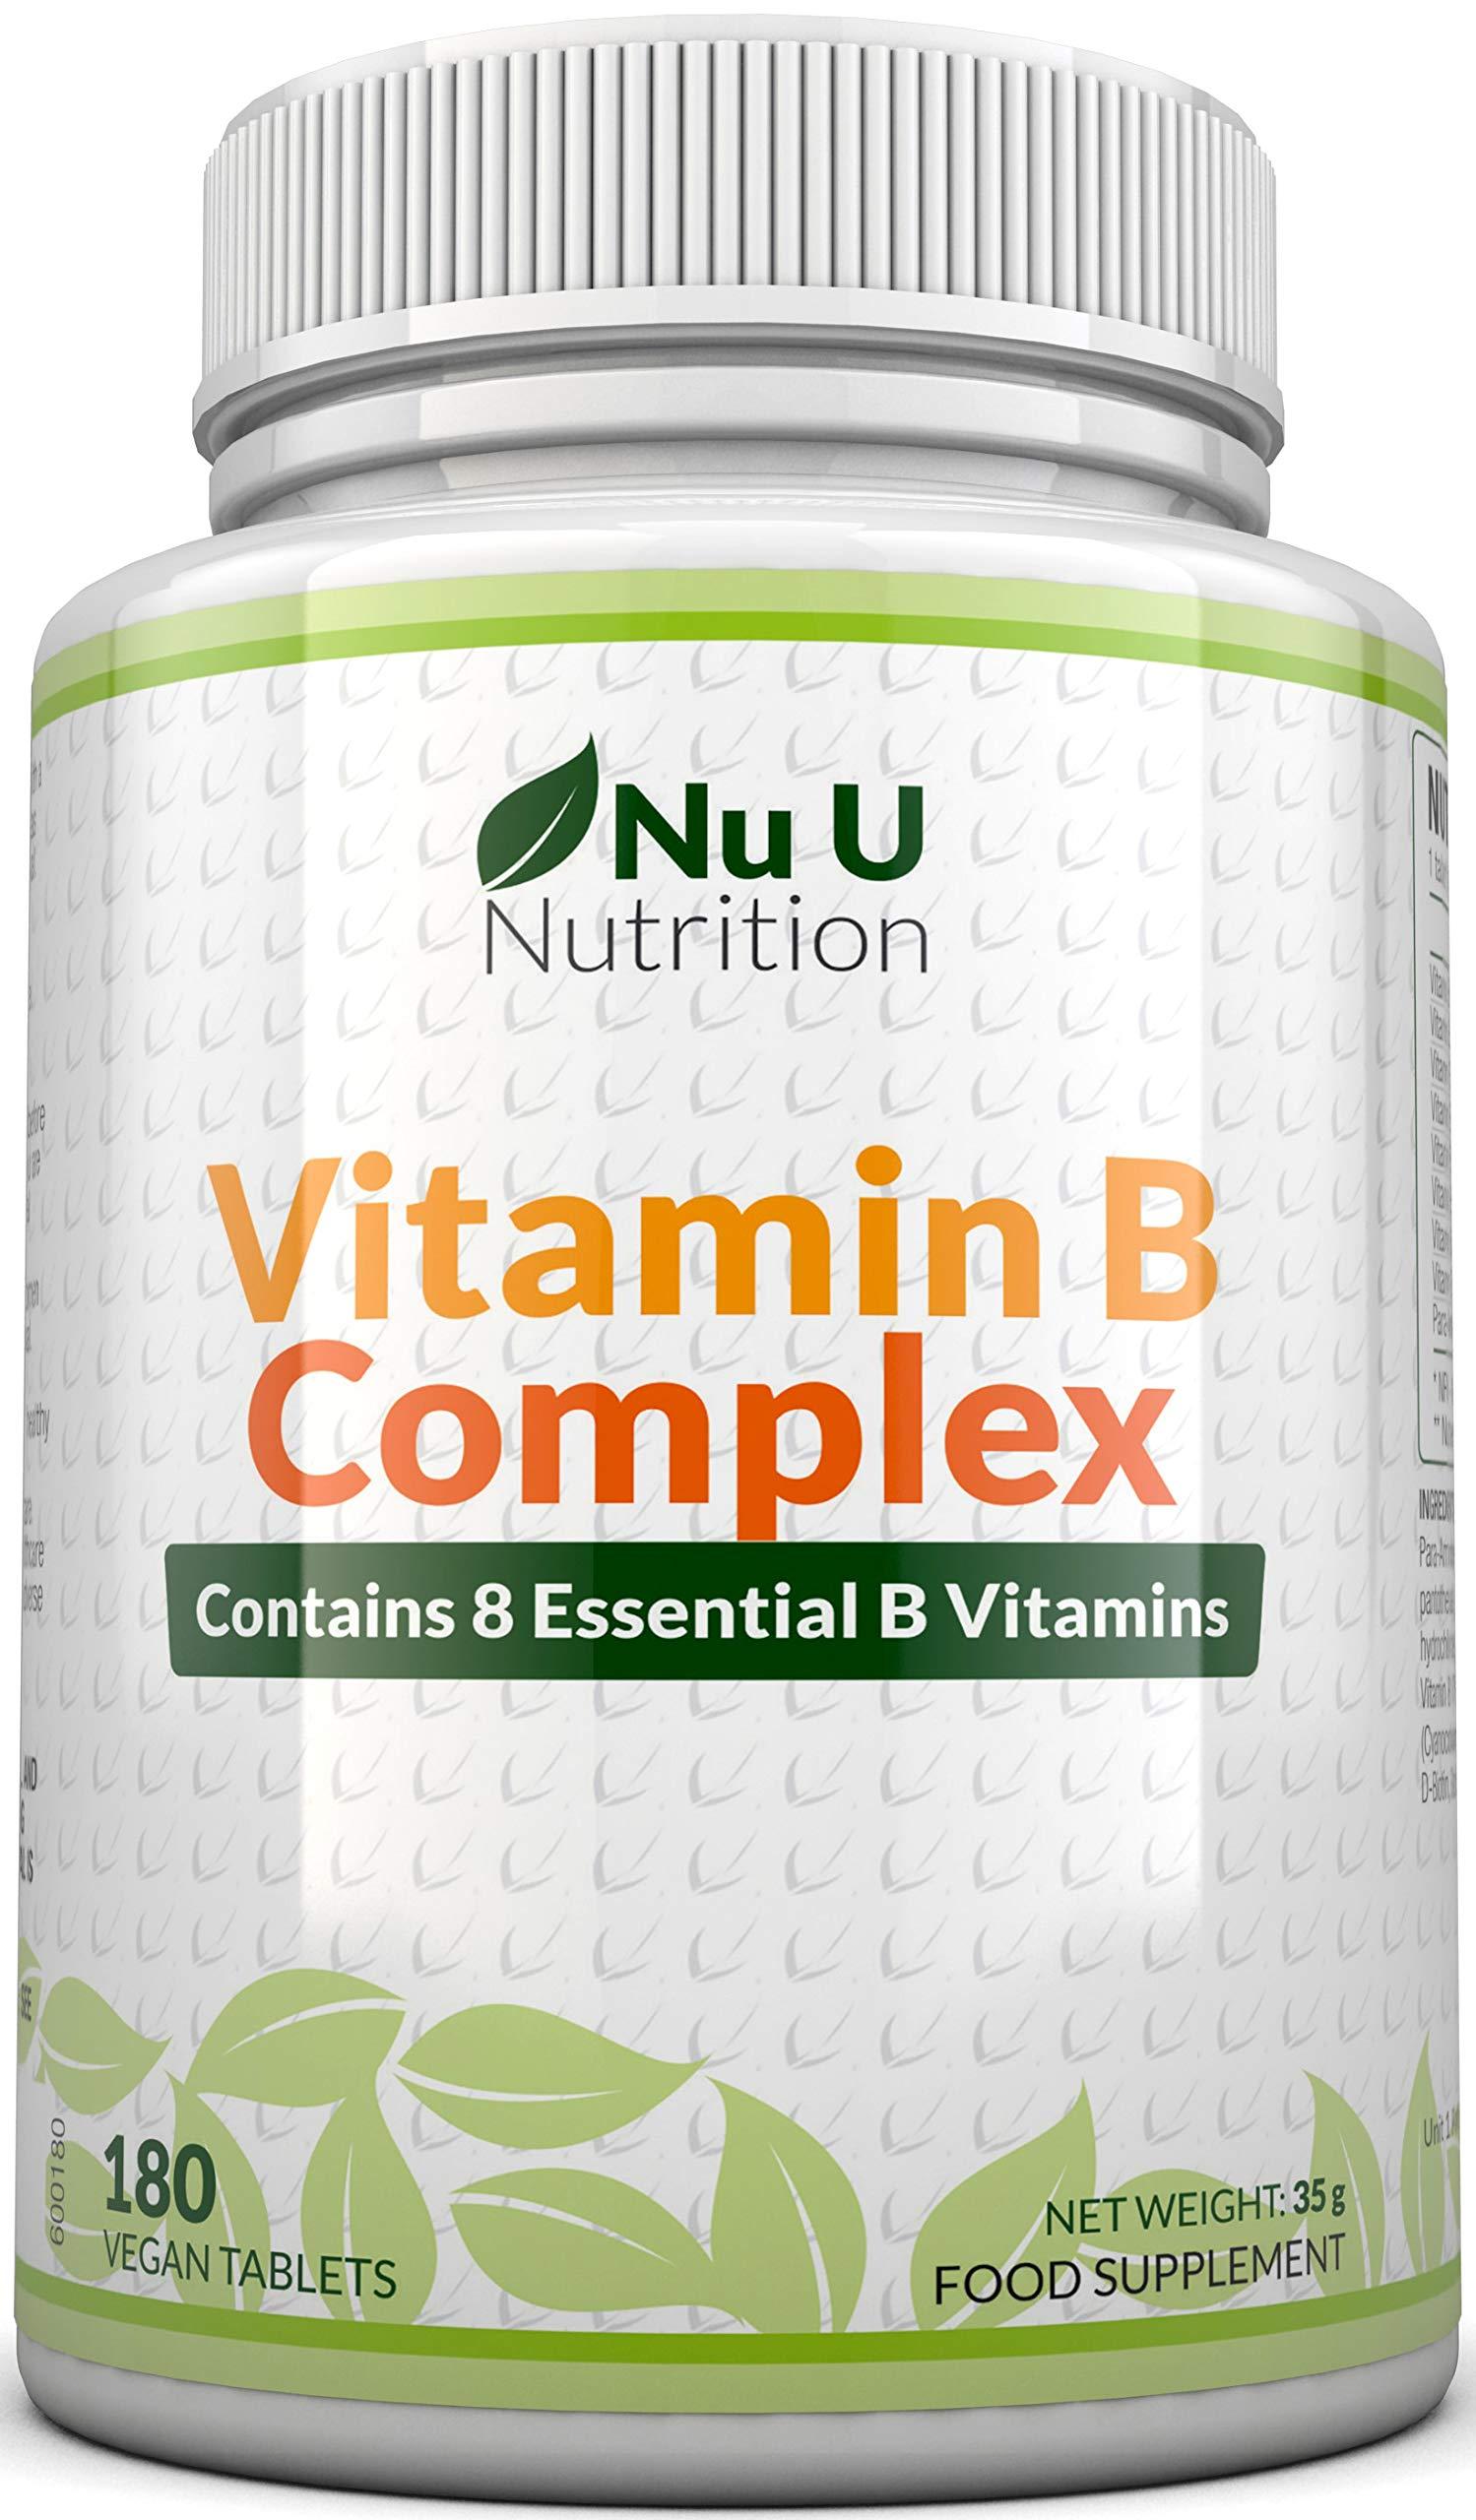 Vitamin B Complex 180 Tablets 6 Month Supply Contains All 8 B Vitamins in 1 Tablet, Vitamins B1, B2, B3, B5, B6, B12, Biotin & Folic Acid, High Strength Vitamin B Complex Vegetarian & Vegan